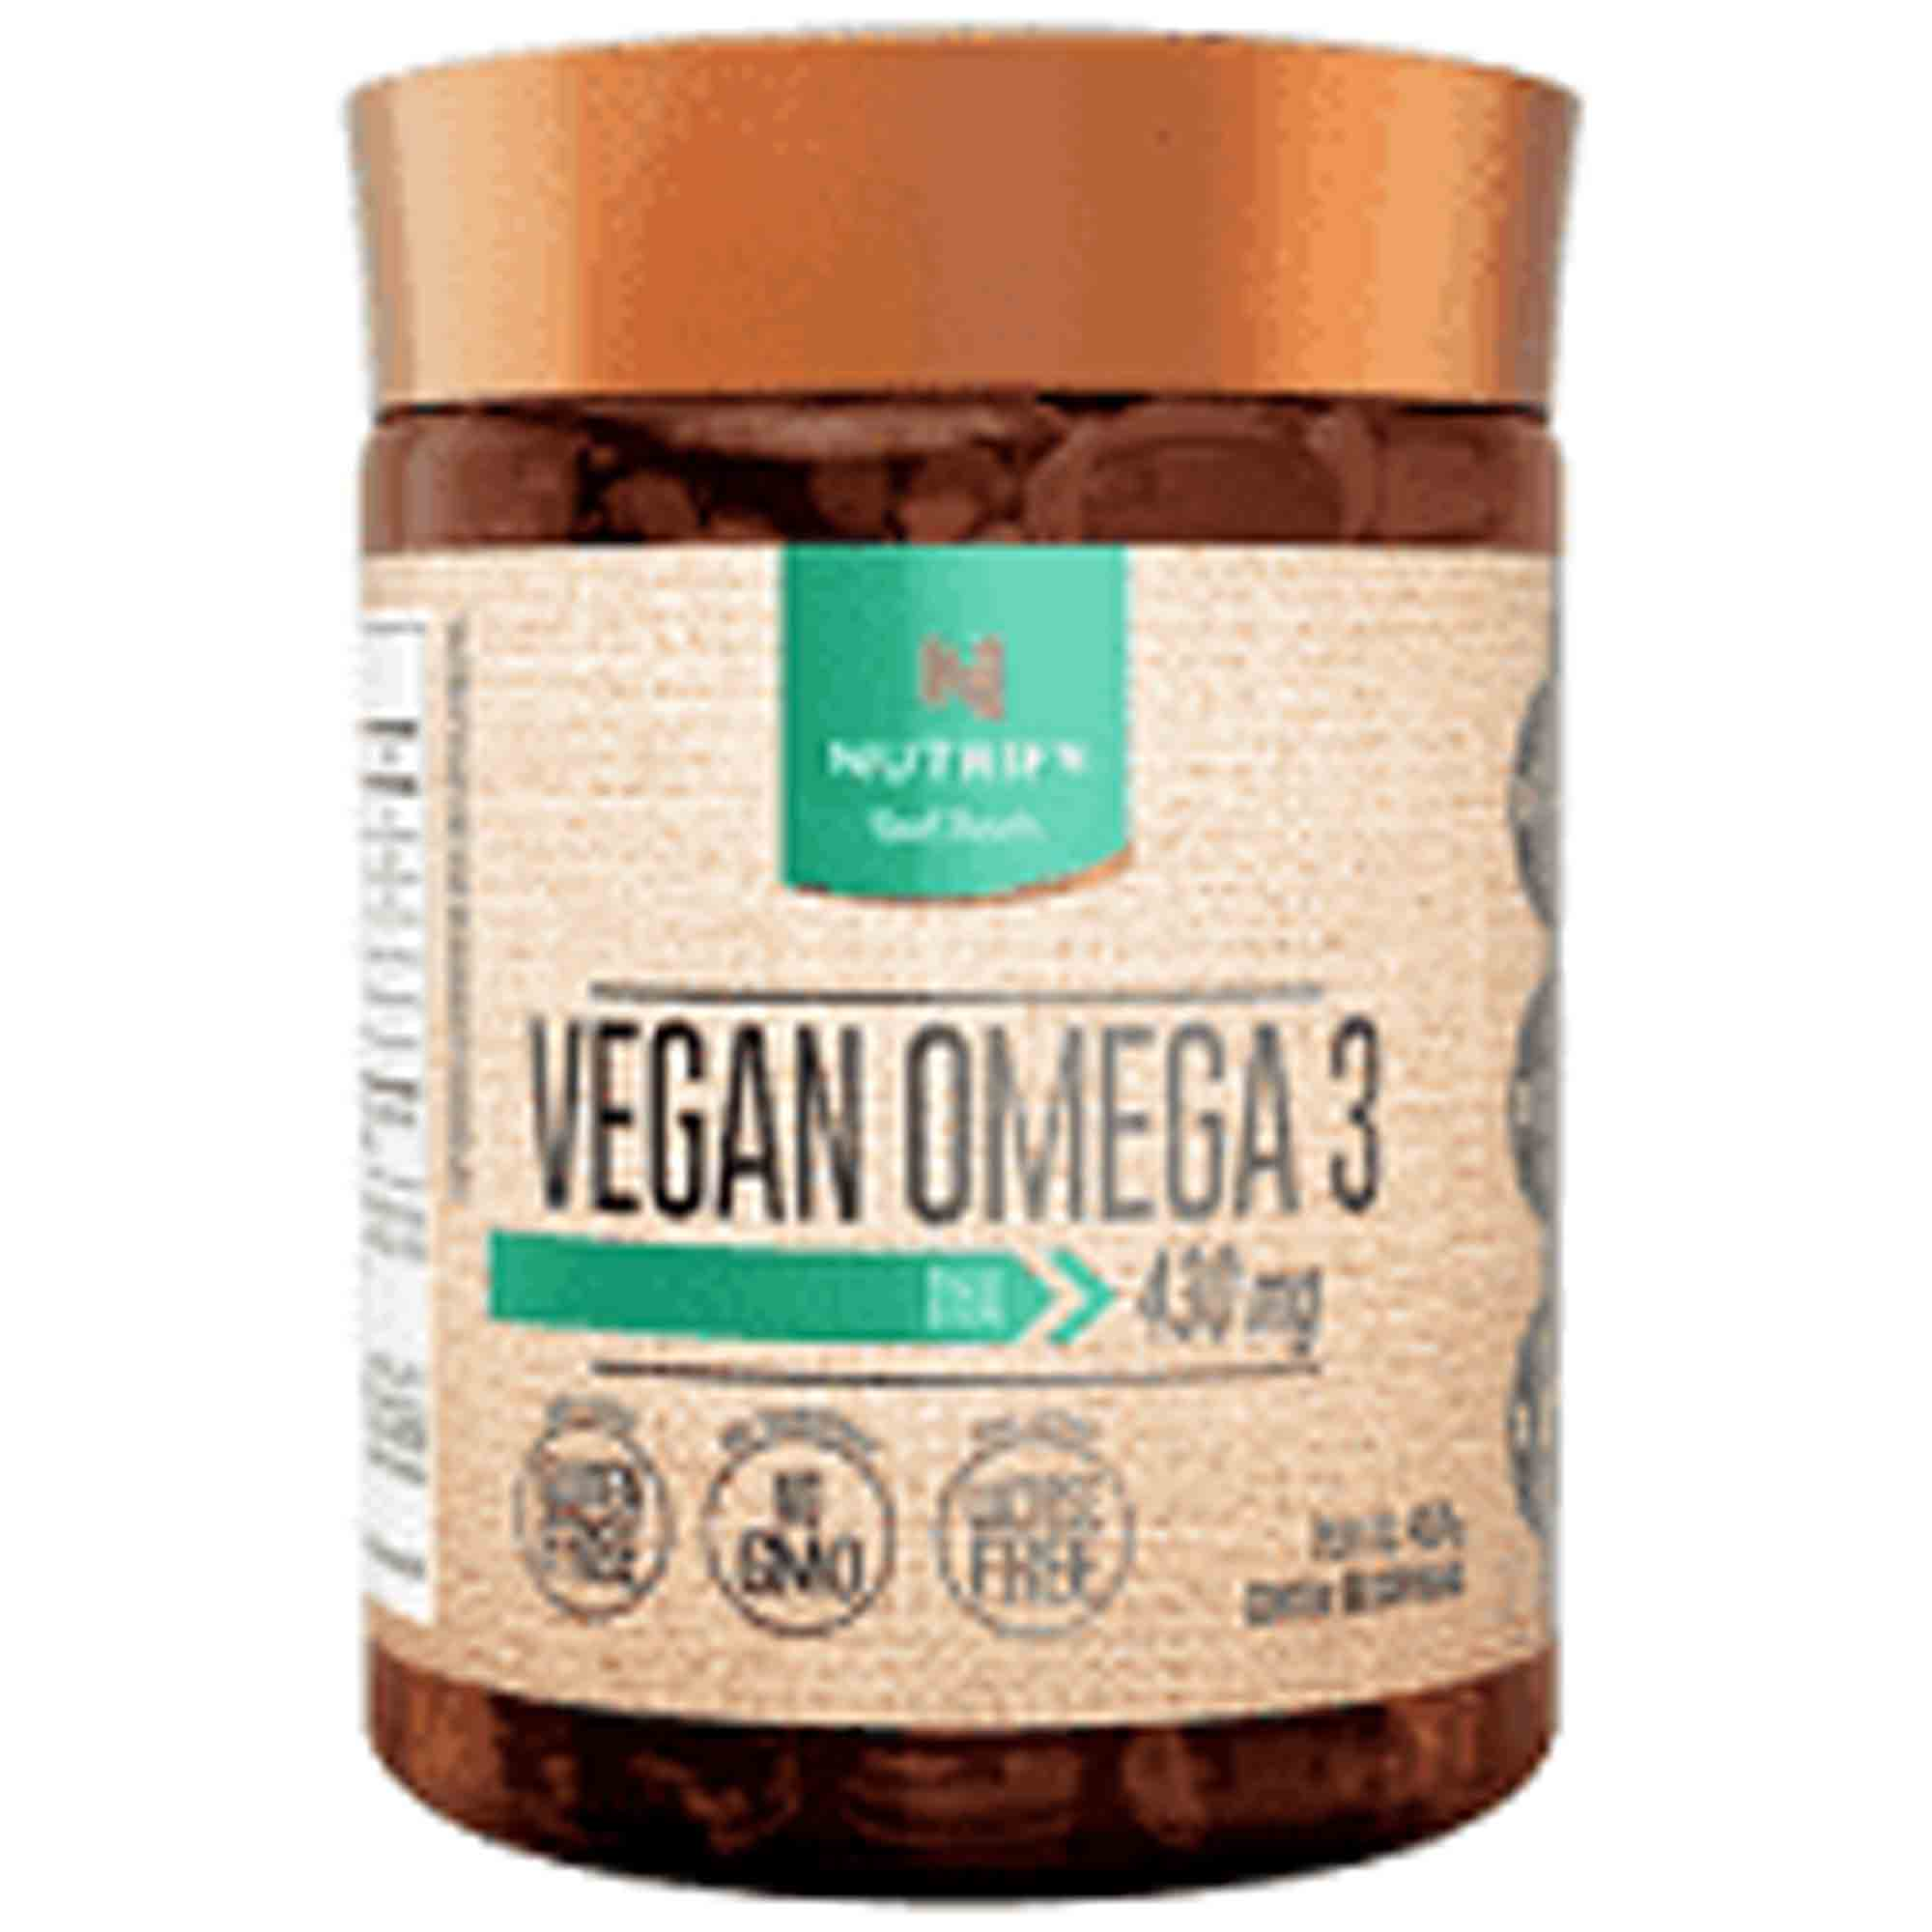 Vegan Omega 3 60caps 430mg Nutrify